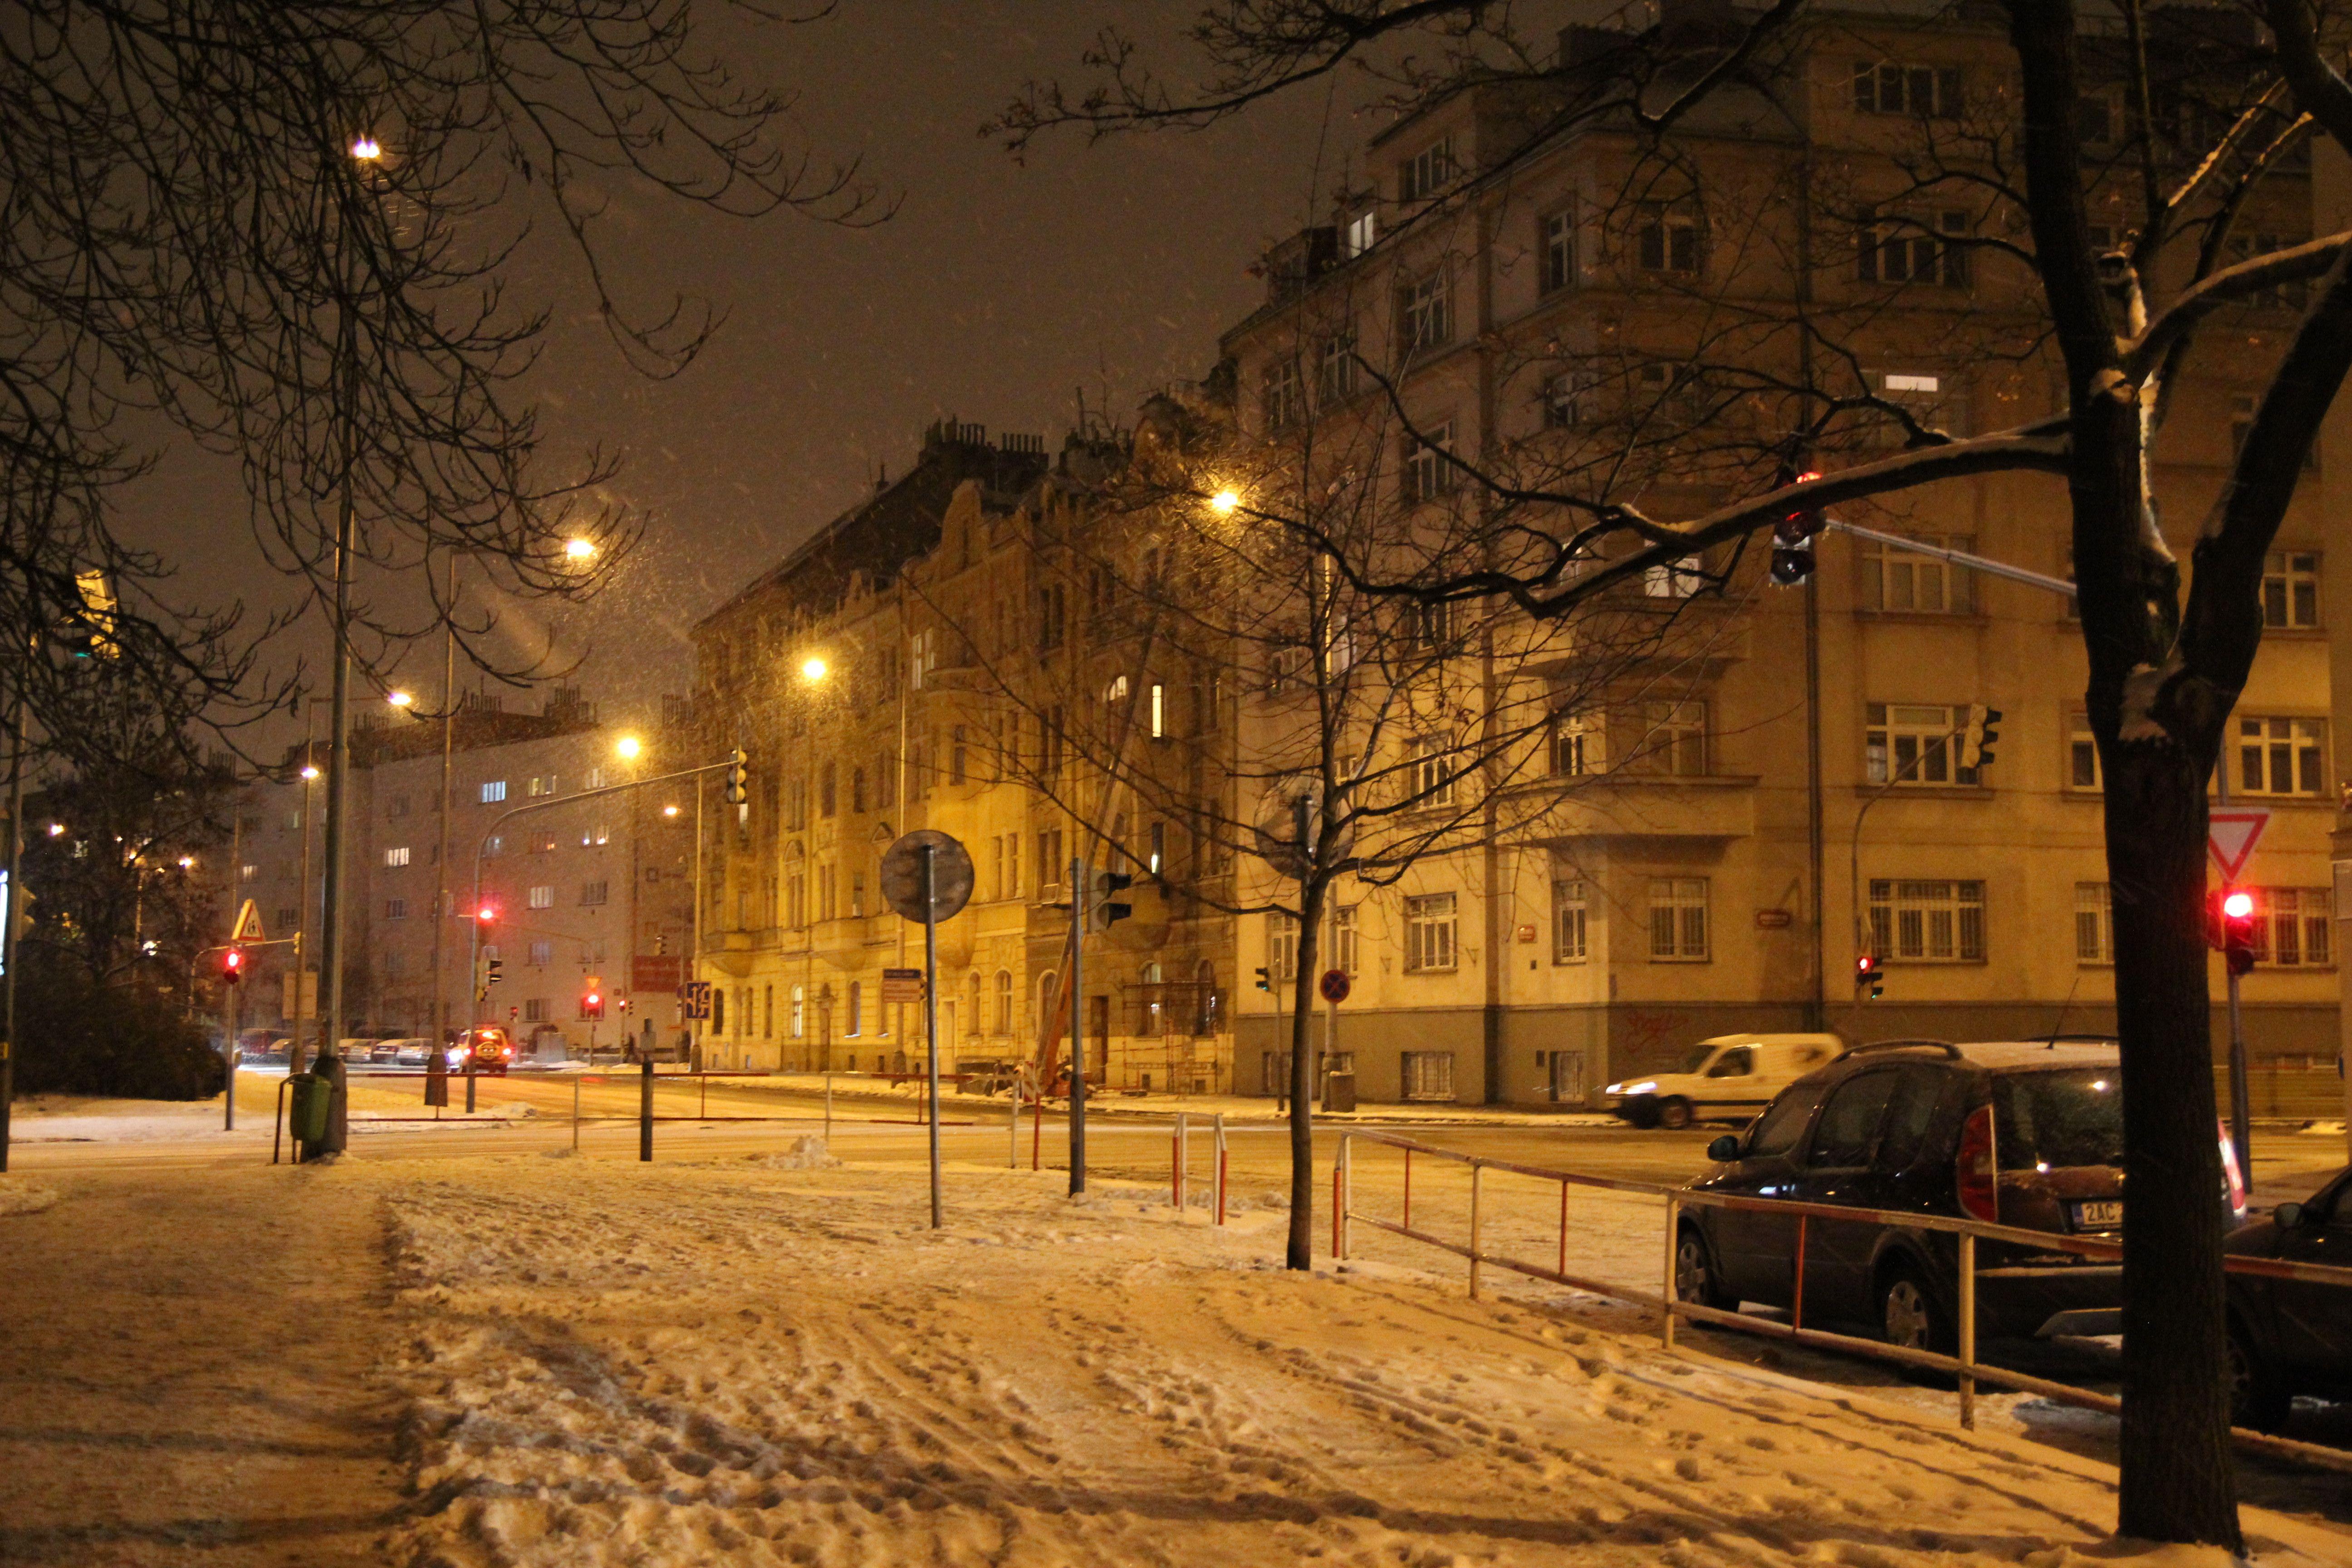 Romantic Winter Night Wallpapers Full Hd Click Wallpapers Winter City Best Cities Winter Vacation